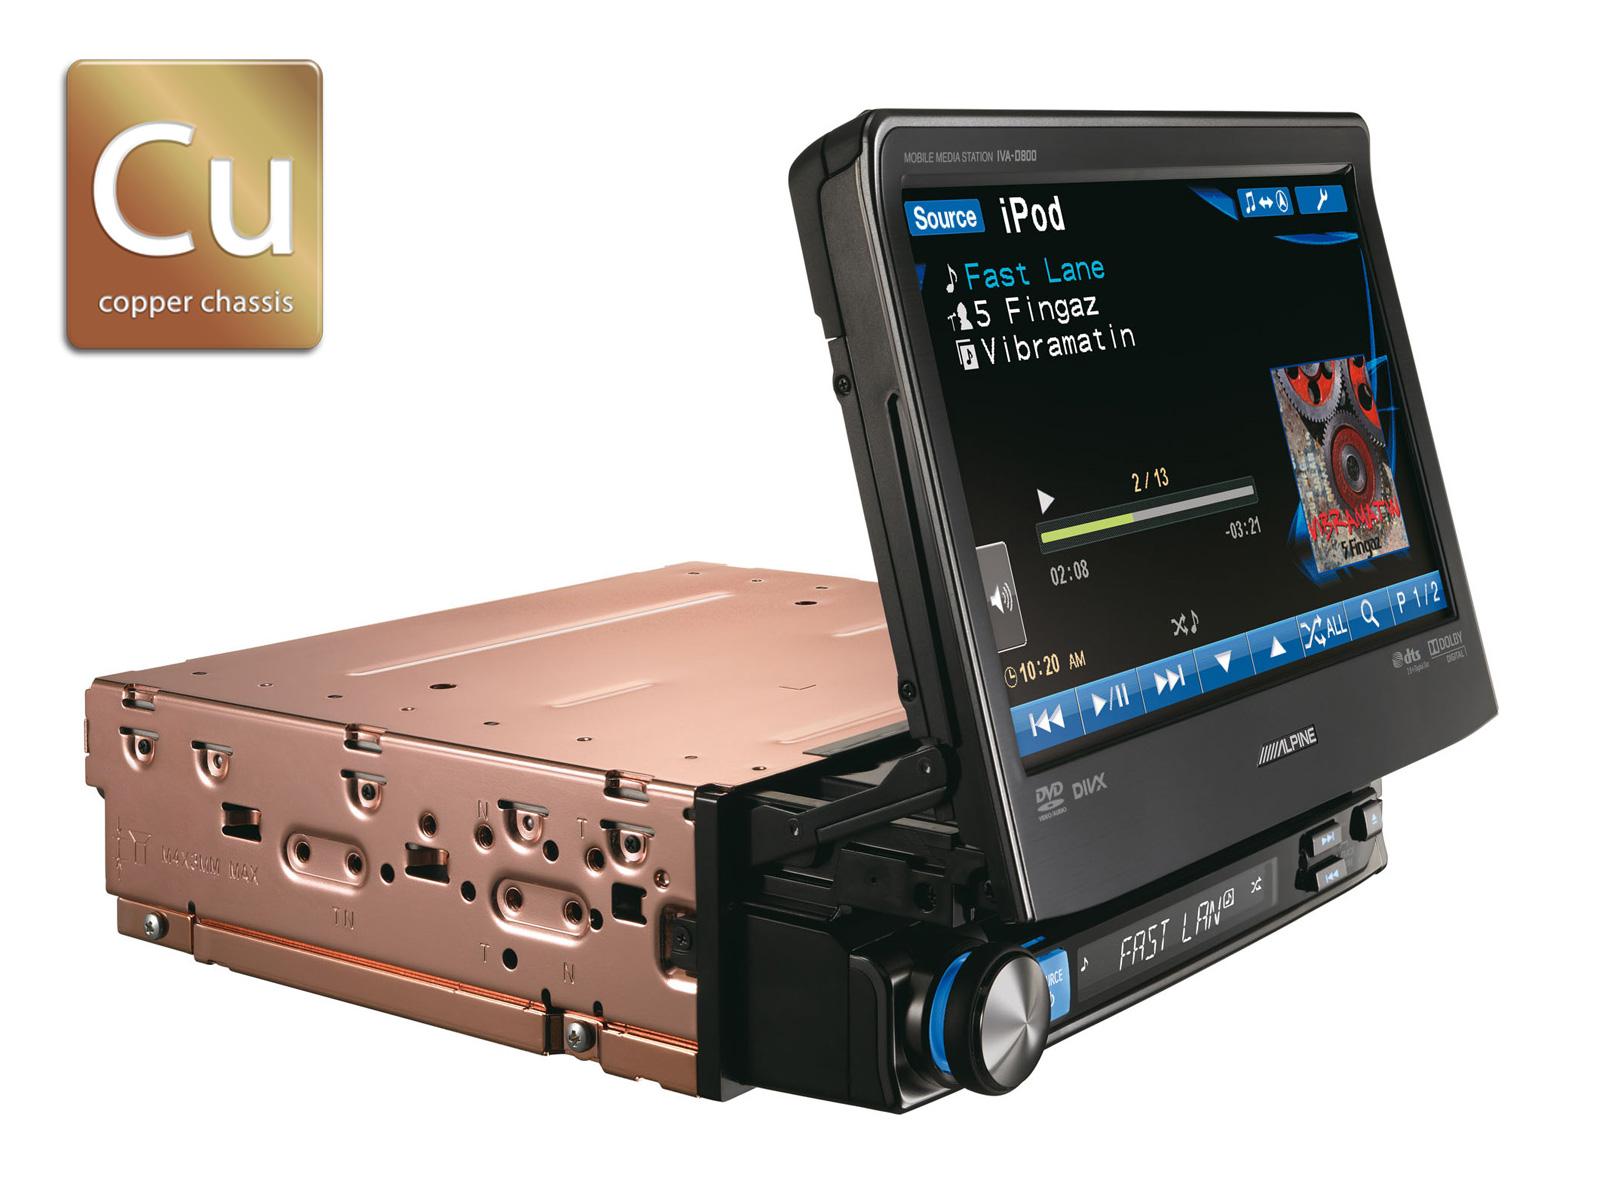 1din mobile media station alpine iva d800r for Mobili madia